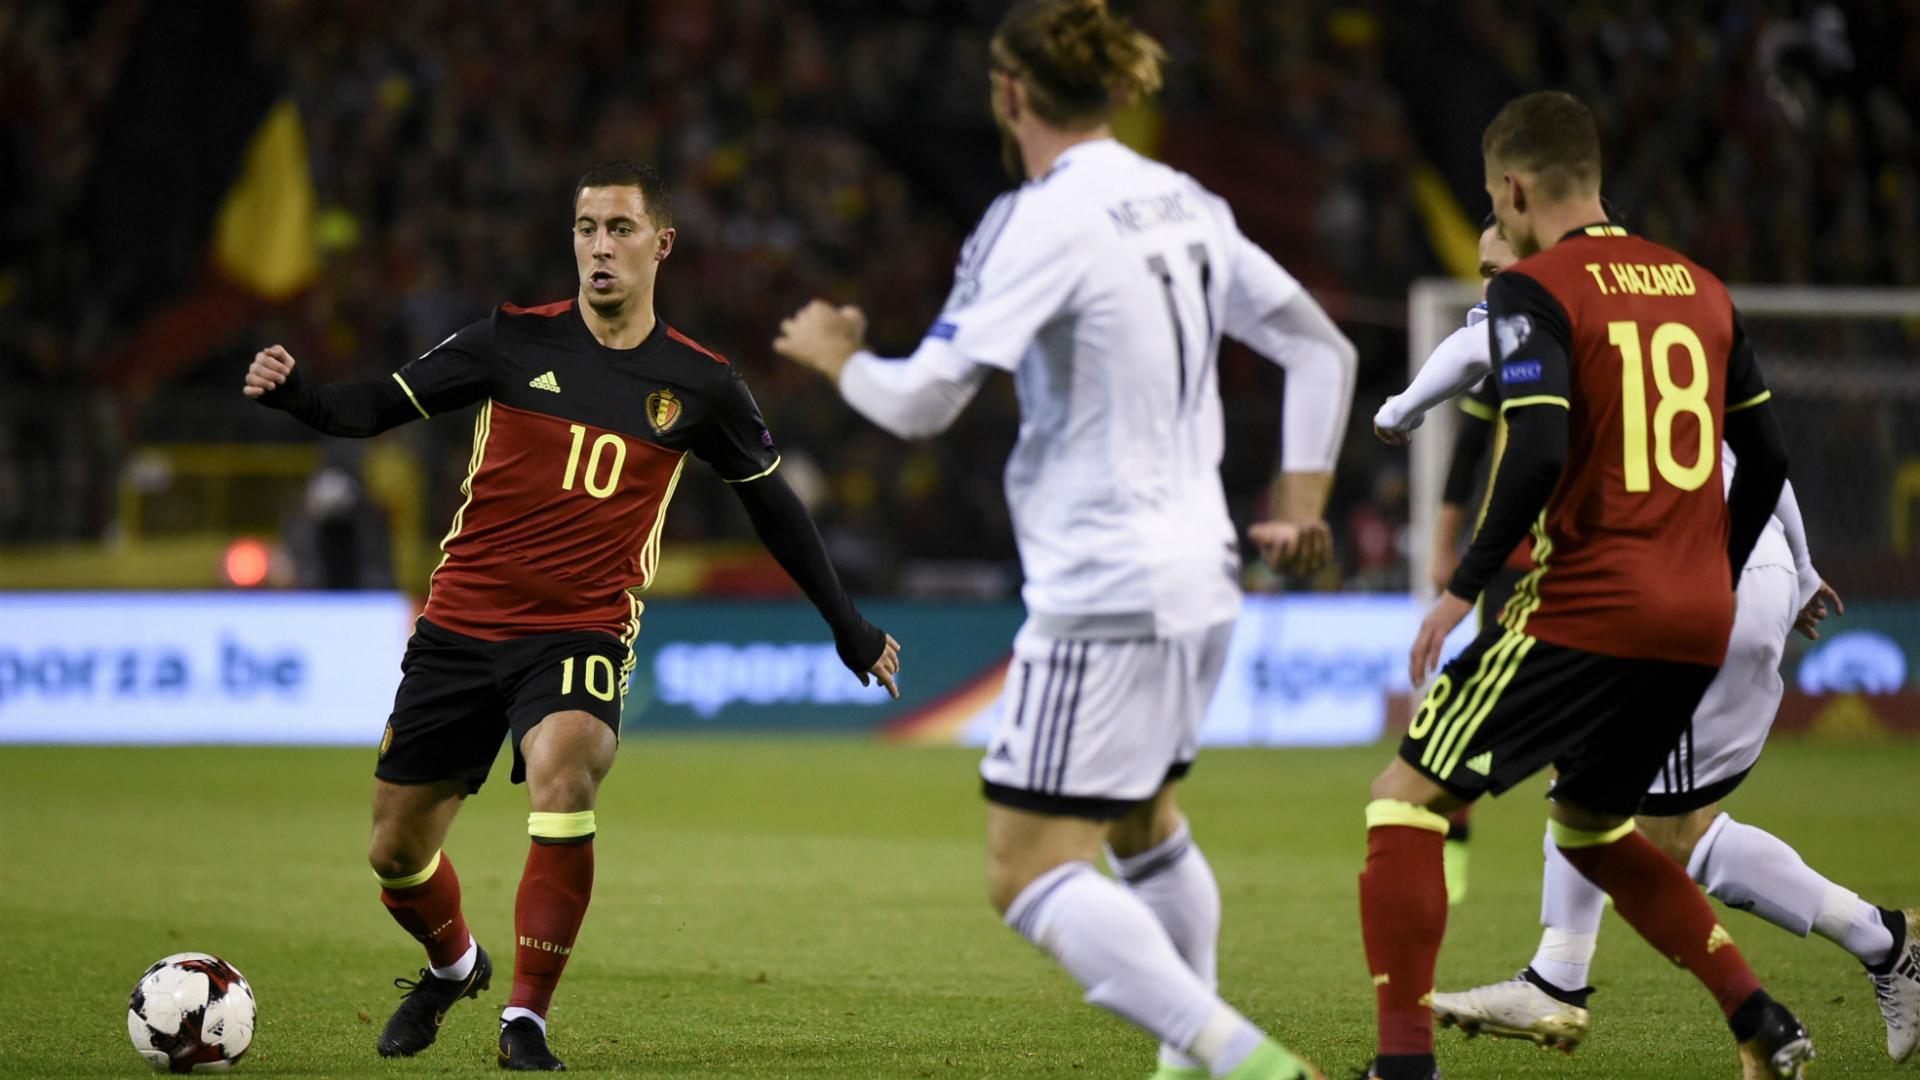 Eden Hazard Thorgan Hazard Belgium Cyprus